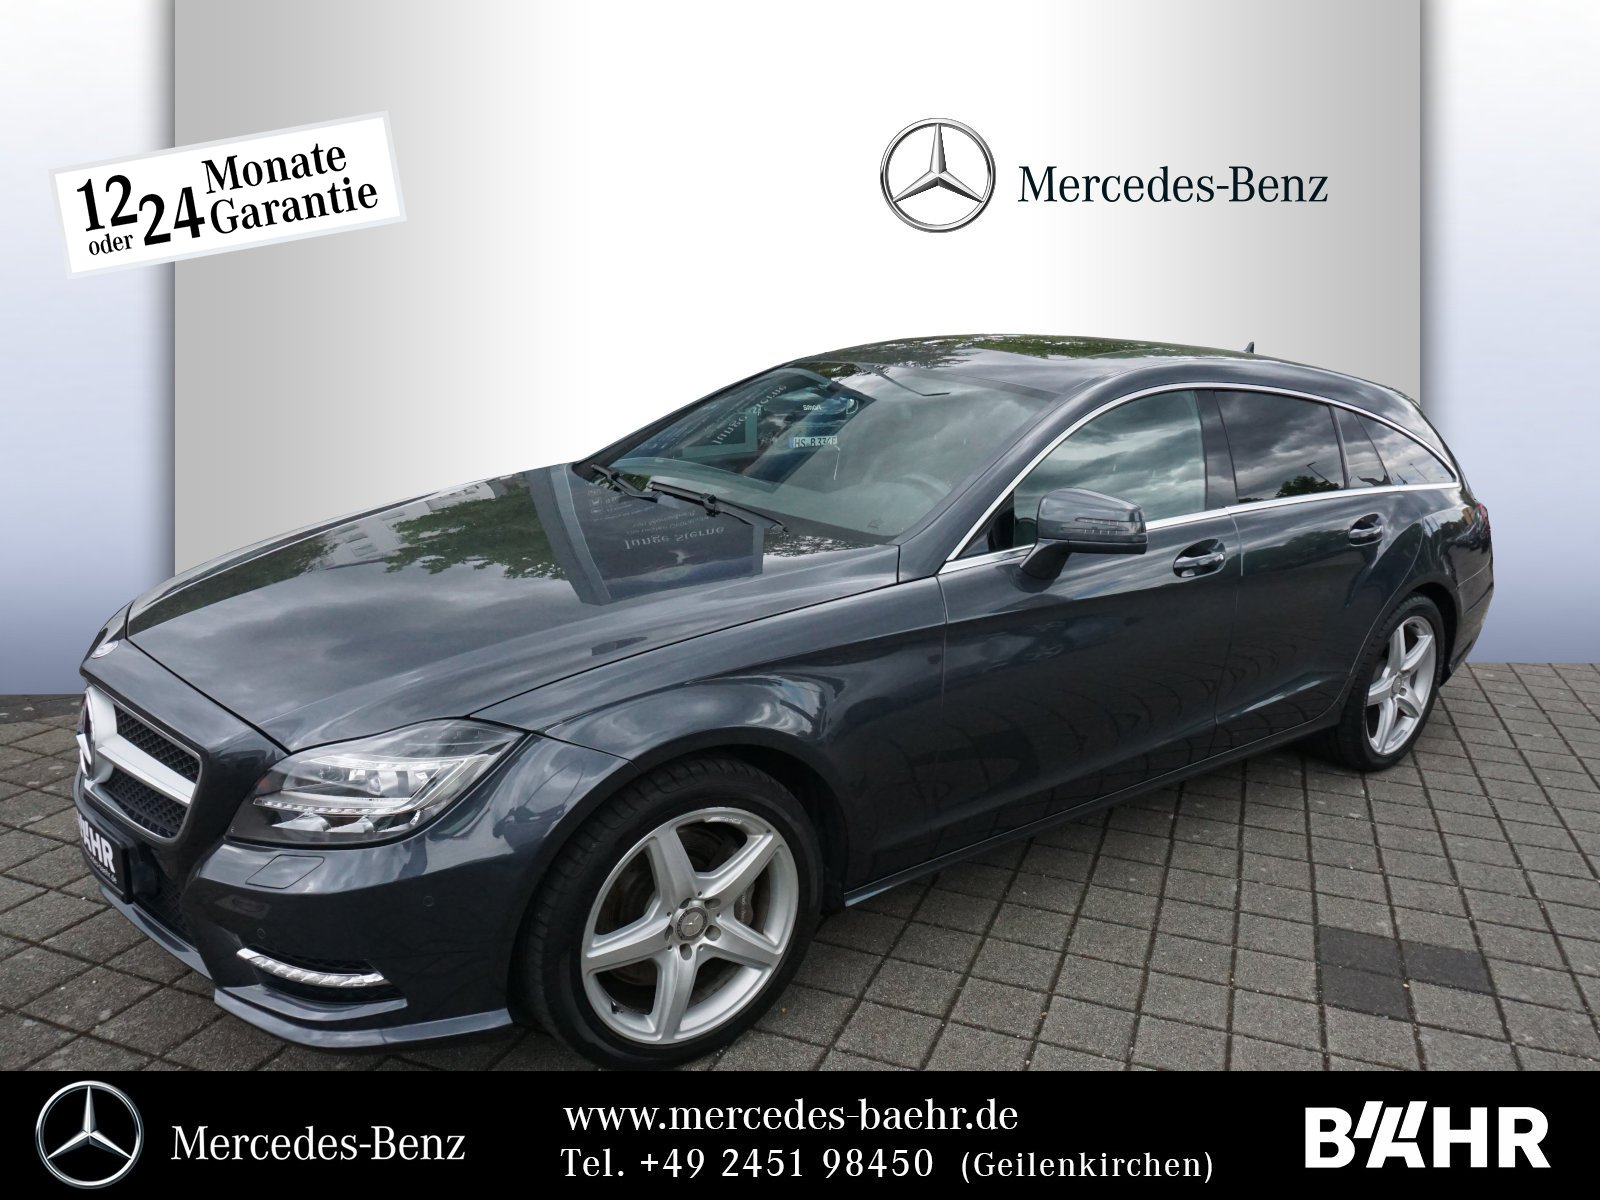 "Mercedes-Benz CLS 350 CDI 4M SB AMG/Comand/ILS/AHK/RFK/LMR-18"", Jahr 2013, diesel"